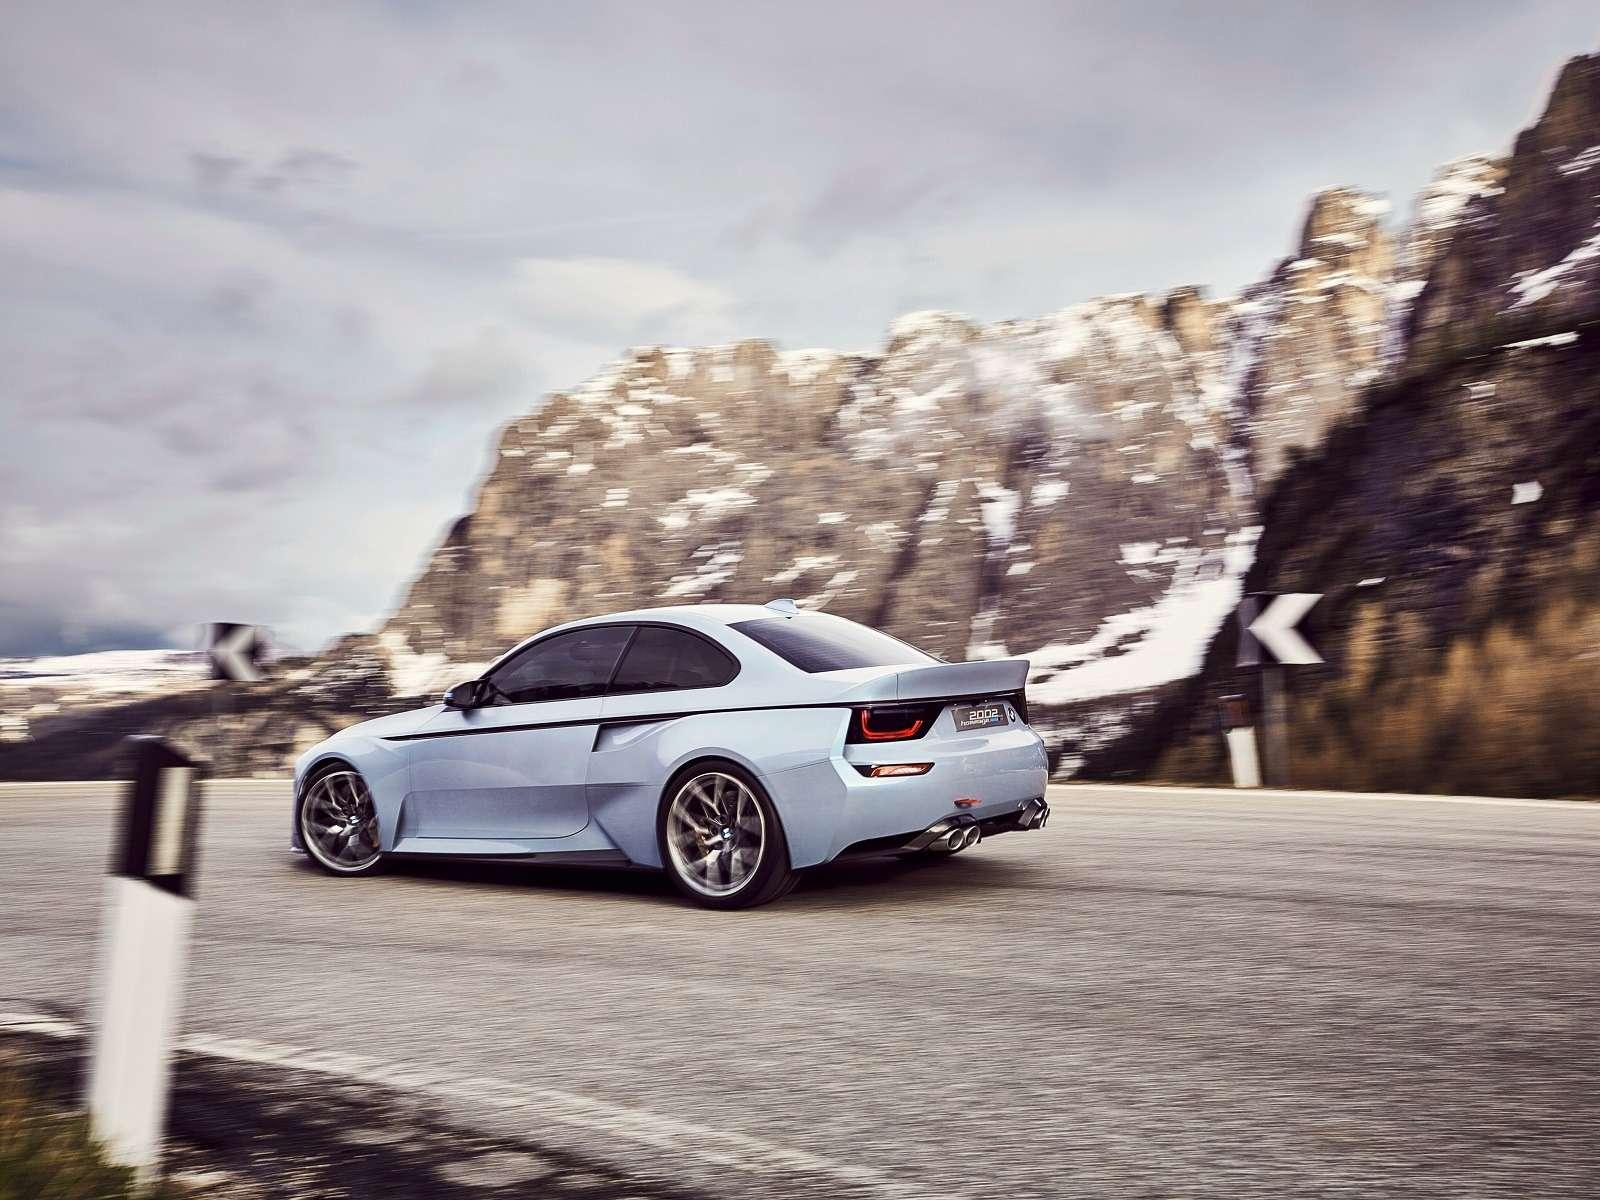 Иллюзия легенды: BMW поупражнялась натему 2002 turbo— фото 590511